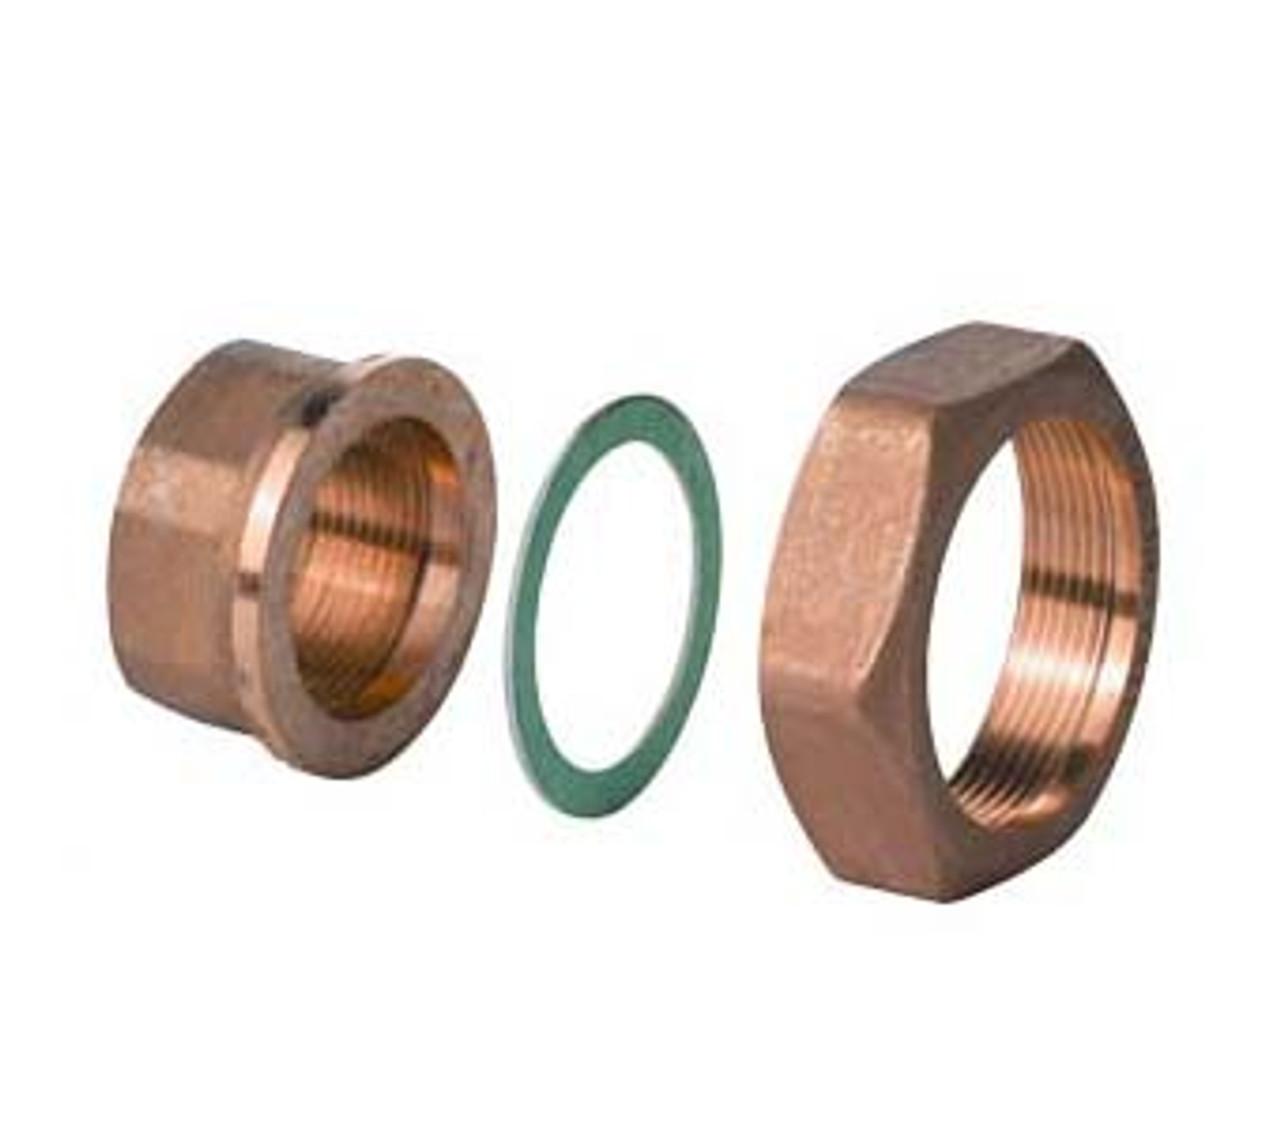 Siemens ALG323B Brass fitting